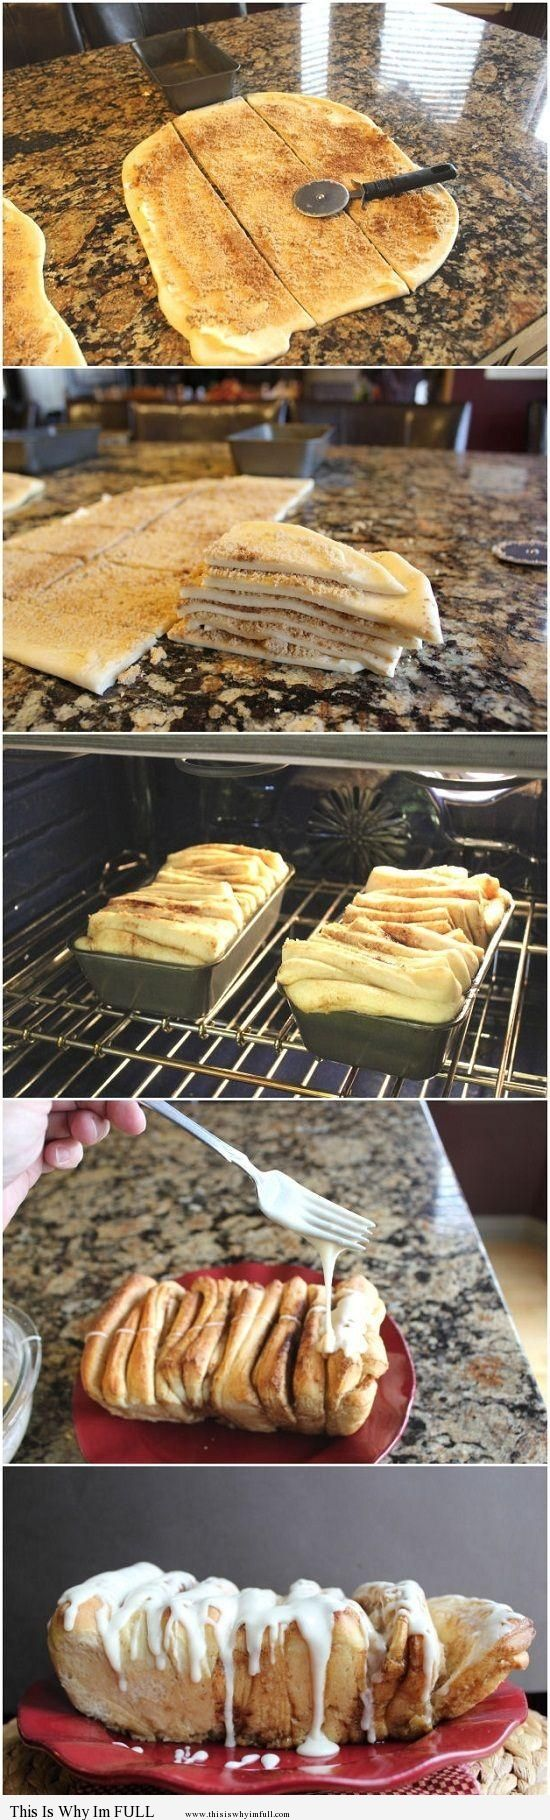 Cinnamon Pull-A-Part Bread - http://www.thisiswhyimfull.com/desserts/cinnamon-pull-a-part-bread-2